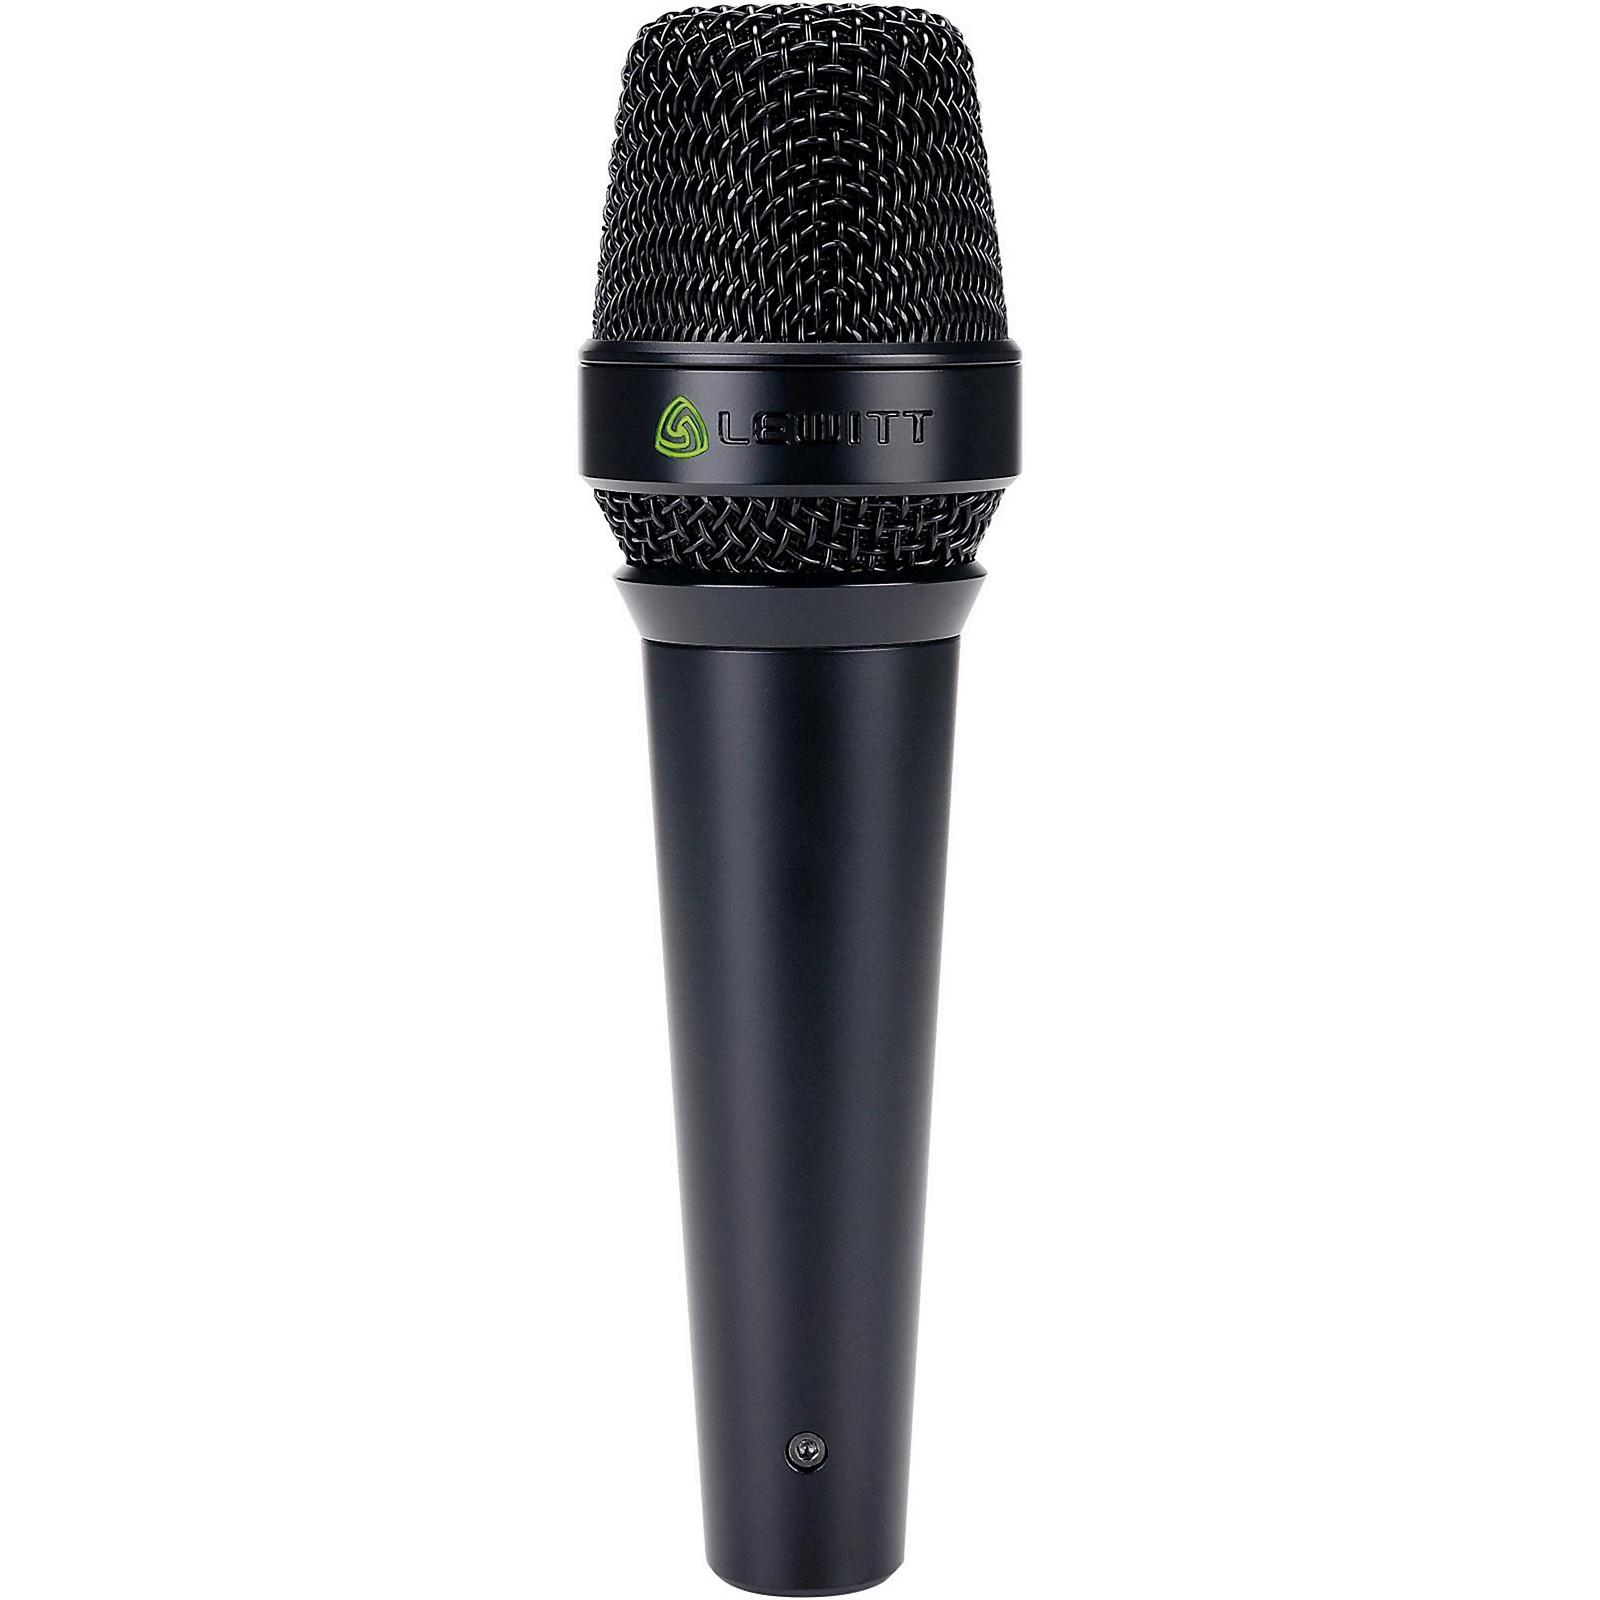 Lewitt Audio Microphones MTP 840 DM Supercardioid Handheld Dynamic Vocal Microphone